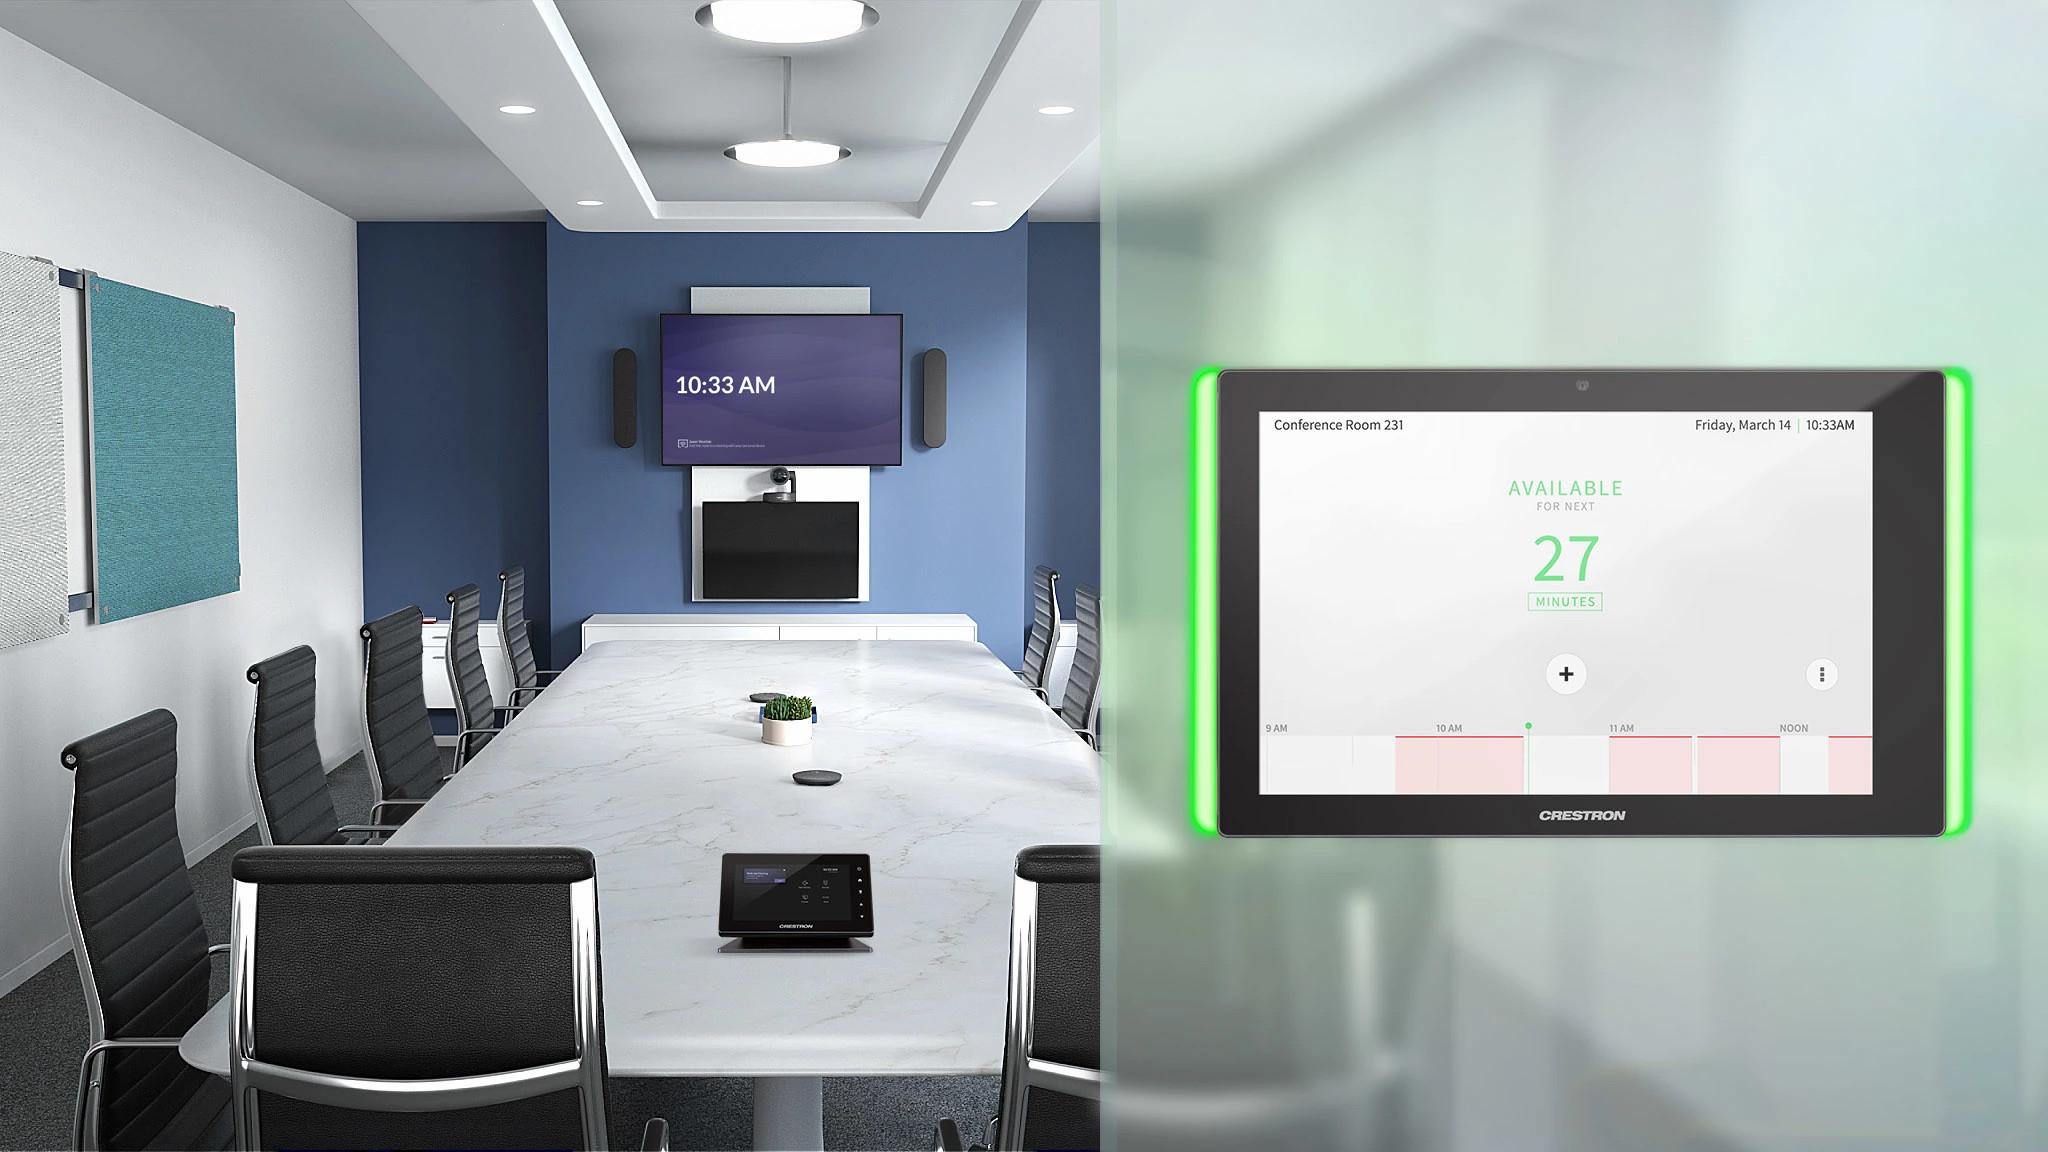 Logitech Meeting Room